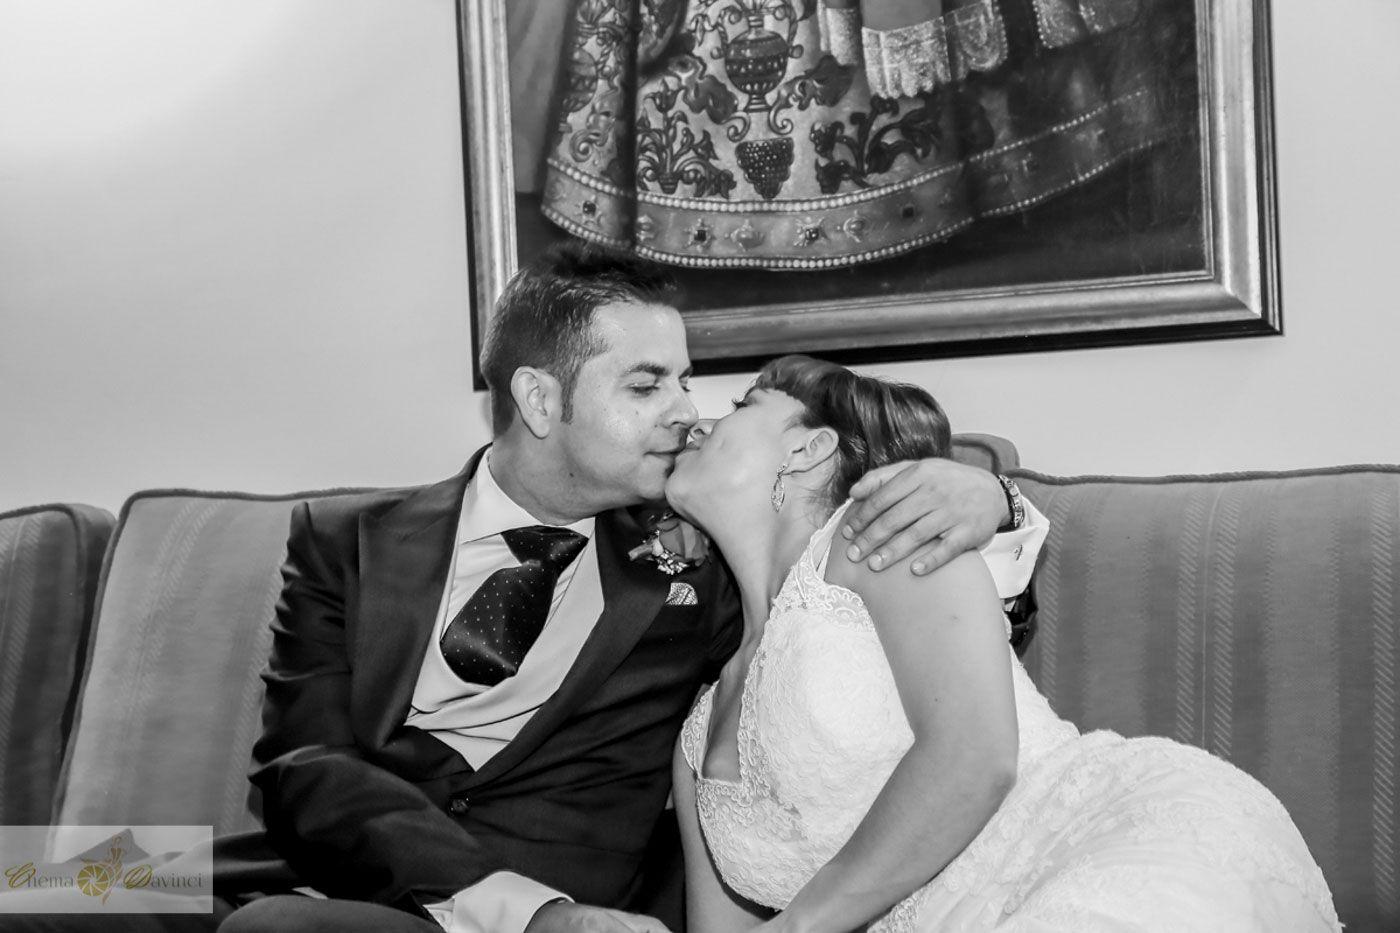 _MG_2100-antecoctail-iglesia-boda-lbertoypili-chemaydavinci-wb